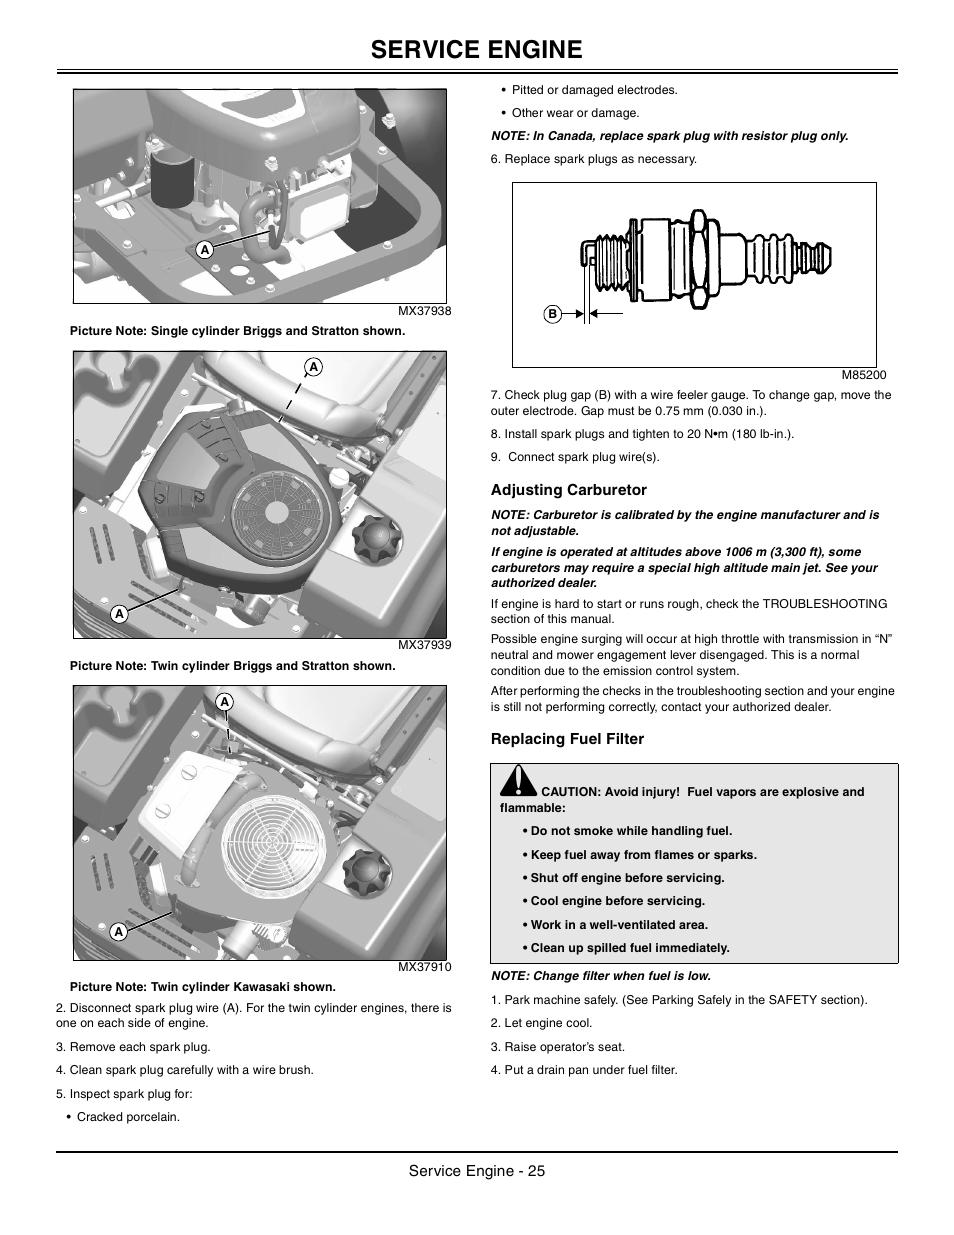 medium resolution of adjusting carburetor replacing fuel filter service engine john deere z425 user manual